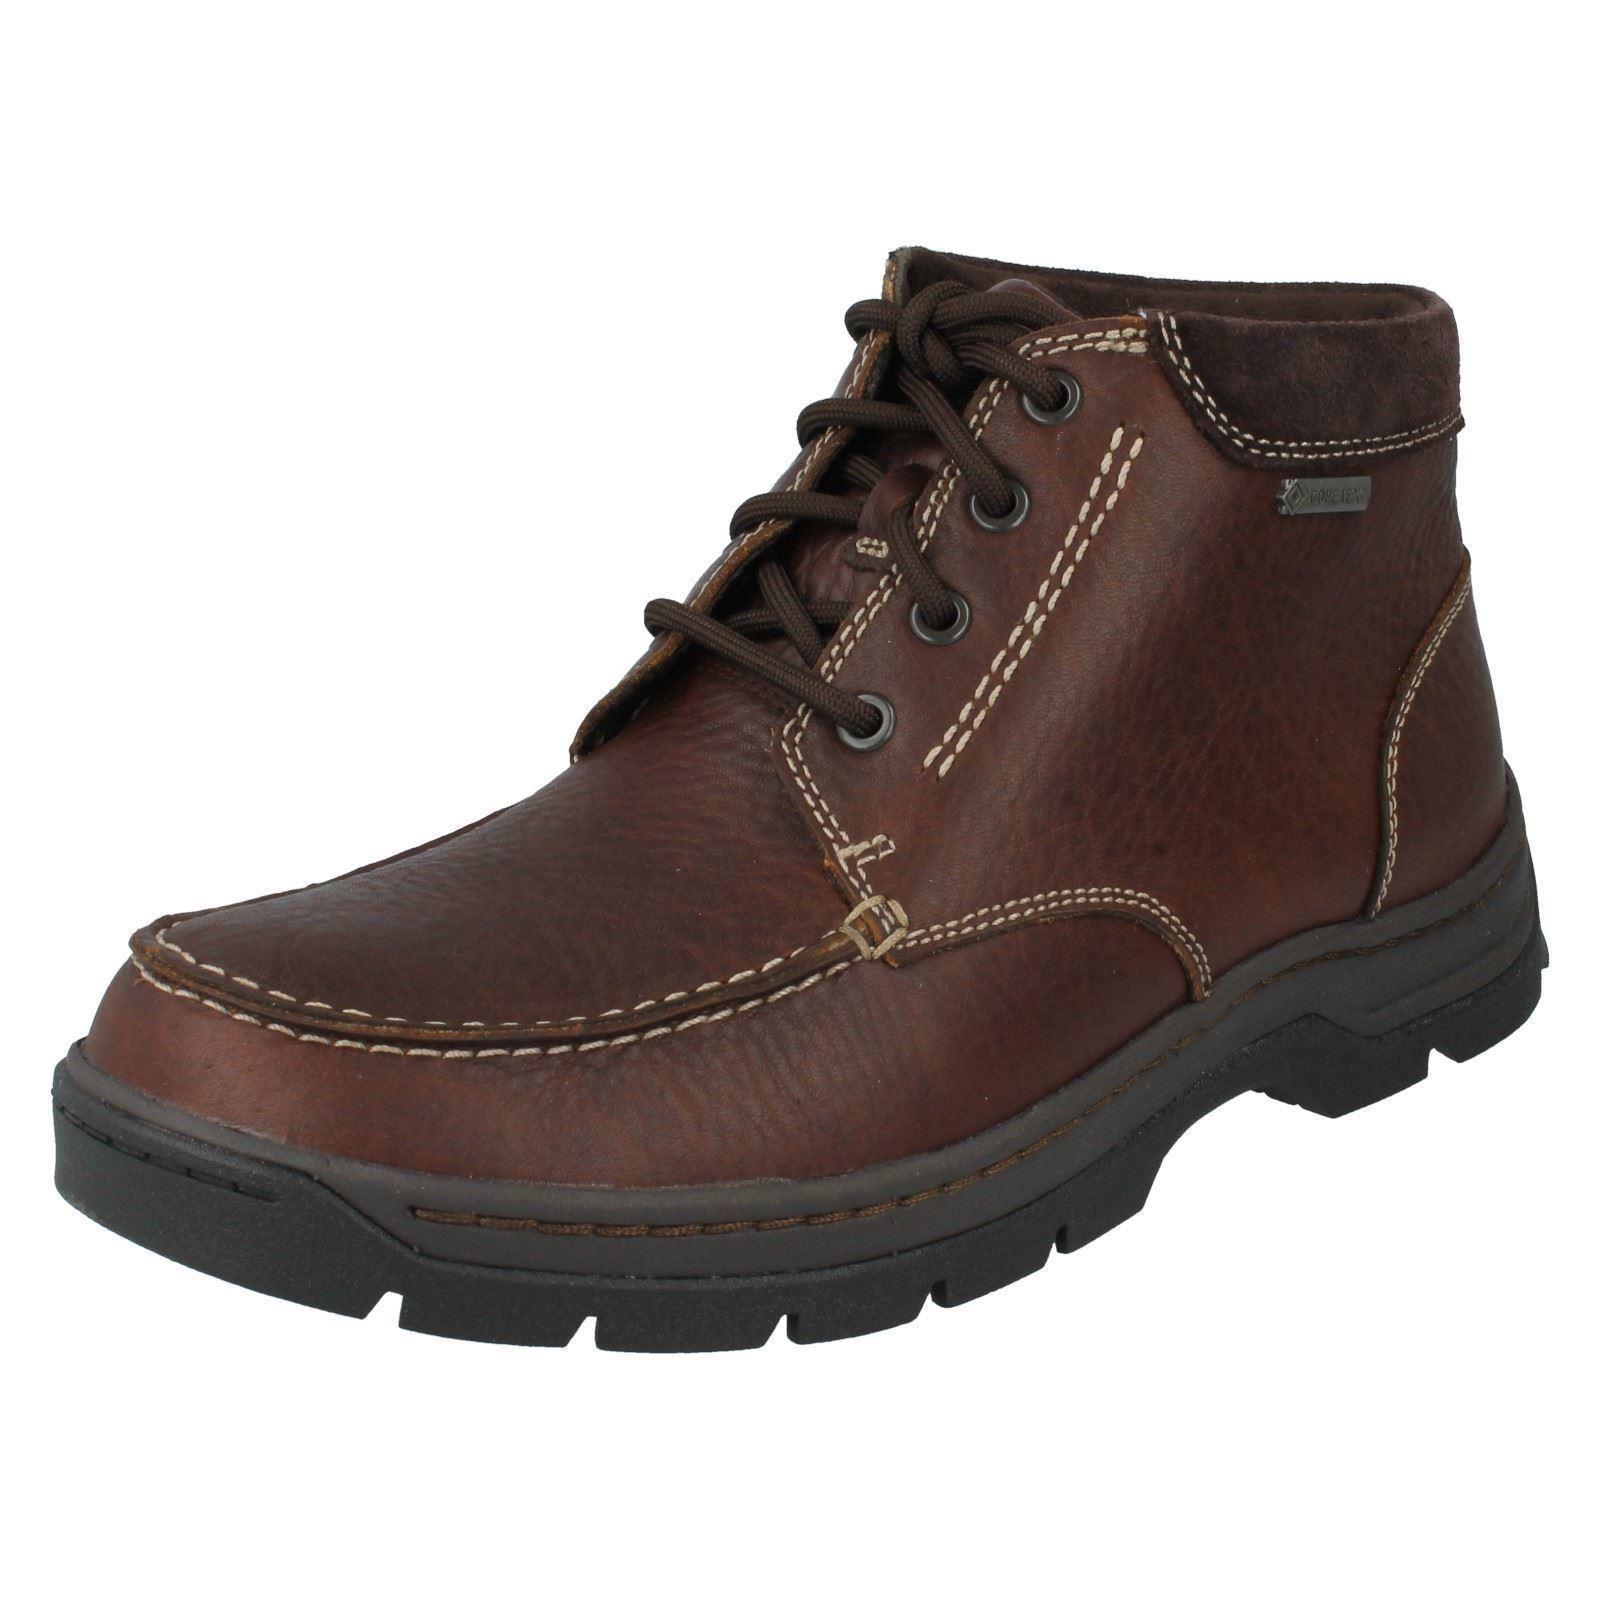 Men's Clarks Casual Boots GTX Style - Stanten Time GTX Boots a58757